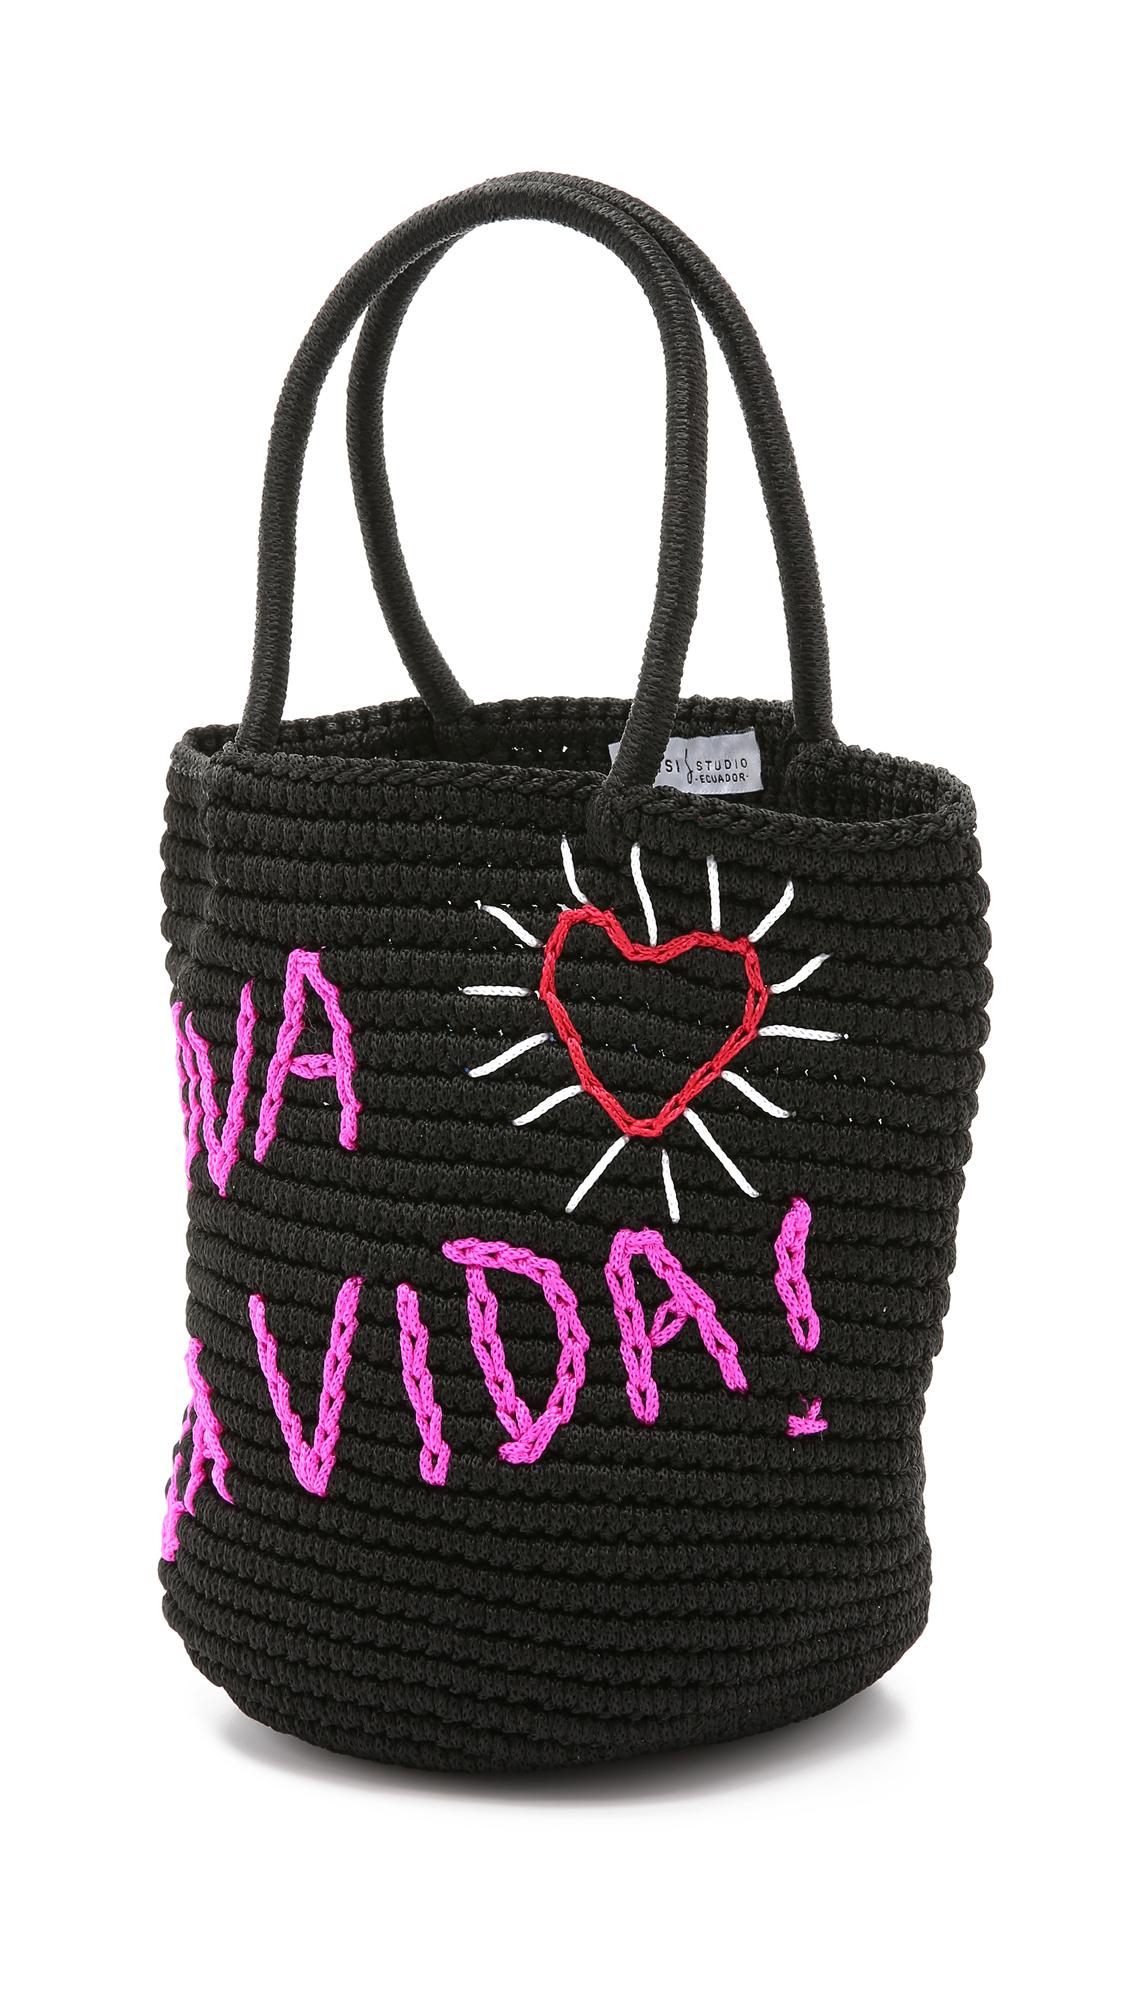 VIDA Tote Bag - YELLOWBLACK by VIDA IBvnLM